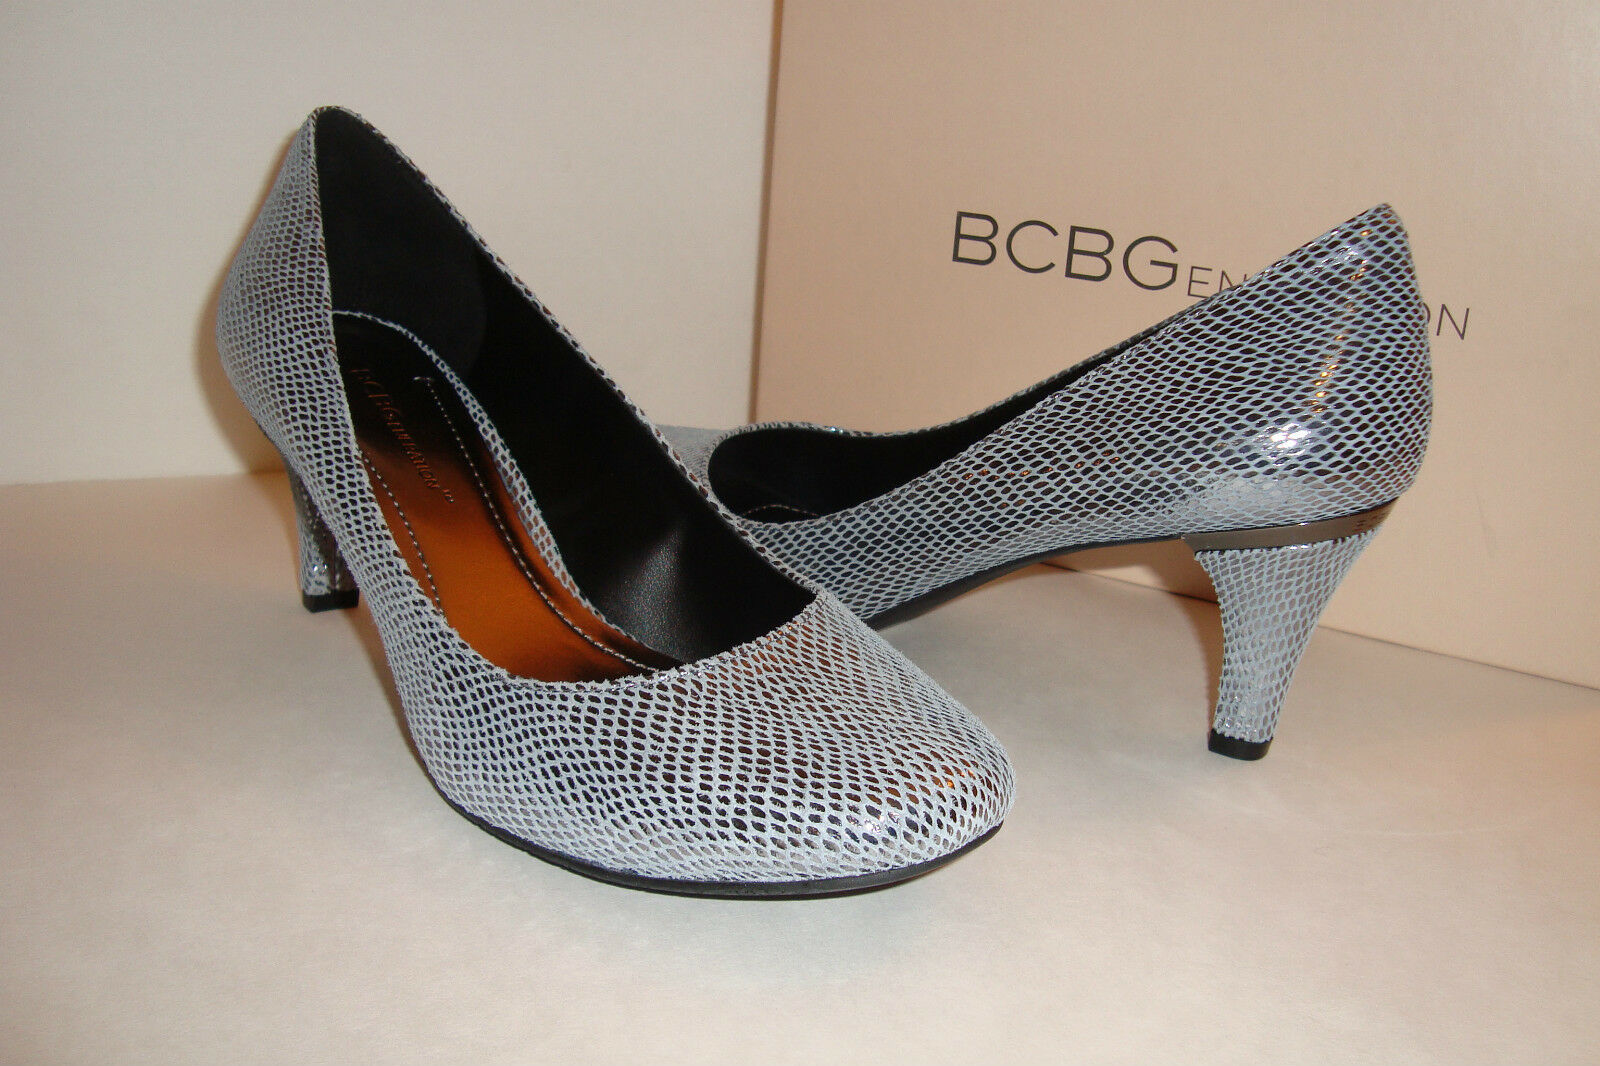 BCBGeneration BCBG Damenschuhe NWB Gumby Pewter Printed Snake Heels Schuhes 6 MED NEW